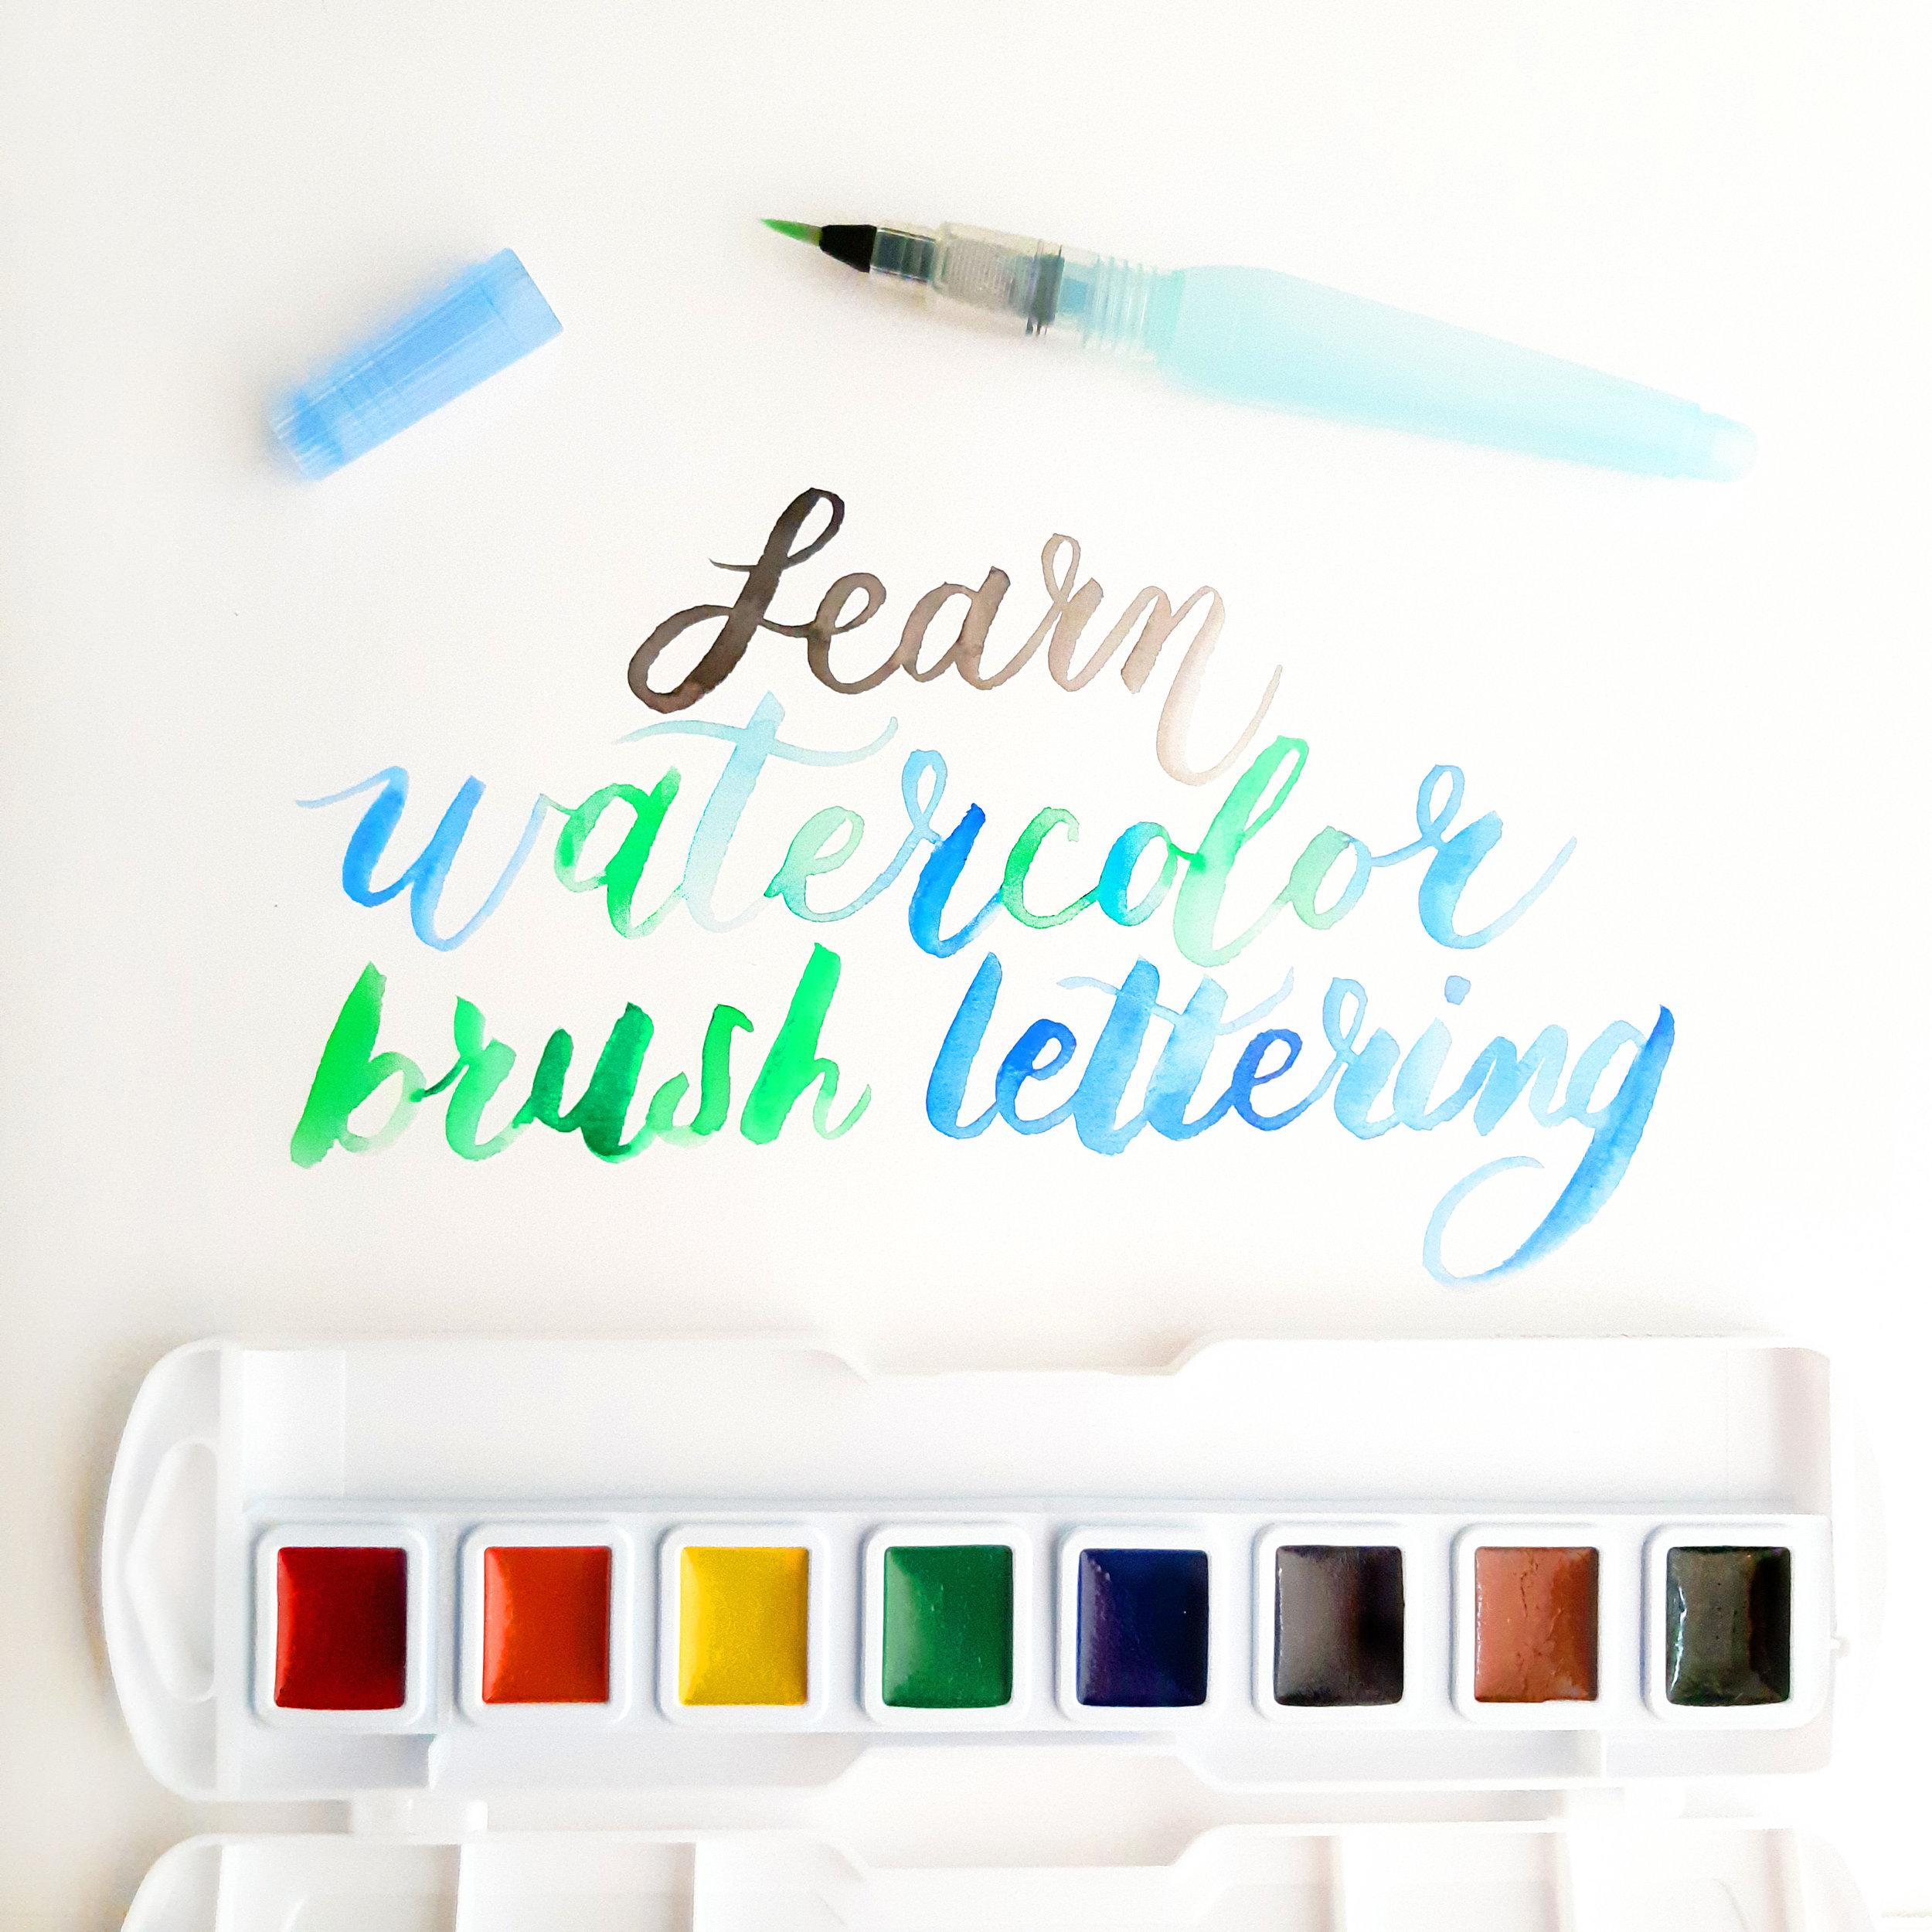 Watercolor Brush Lettering Fall 2019.jpg